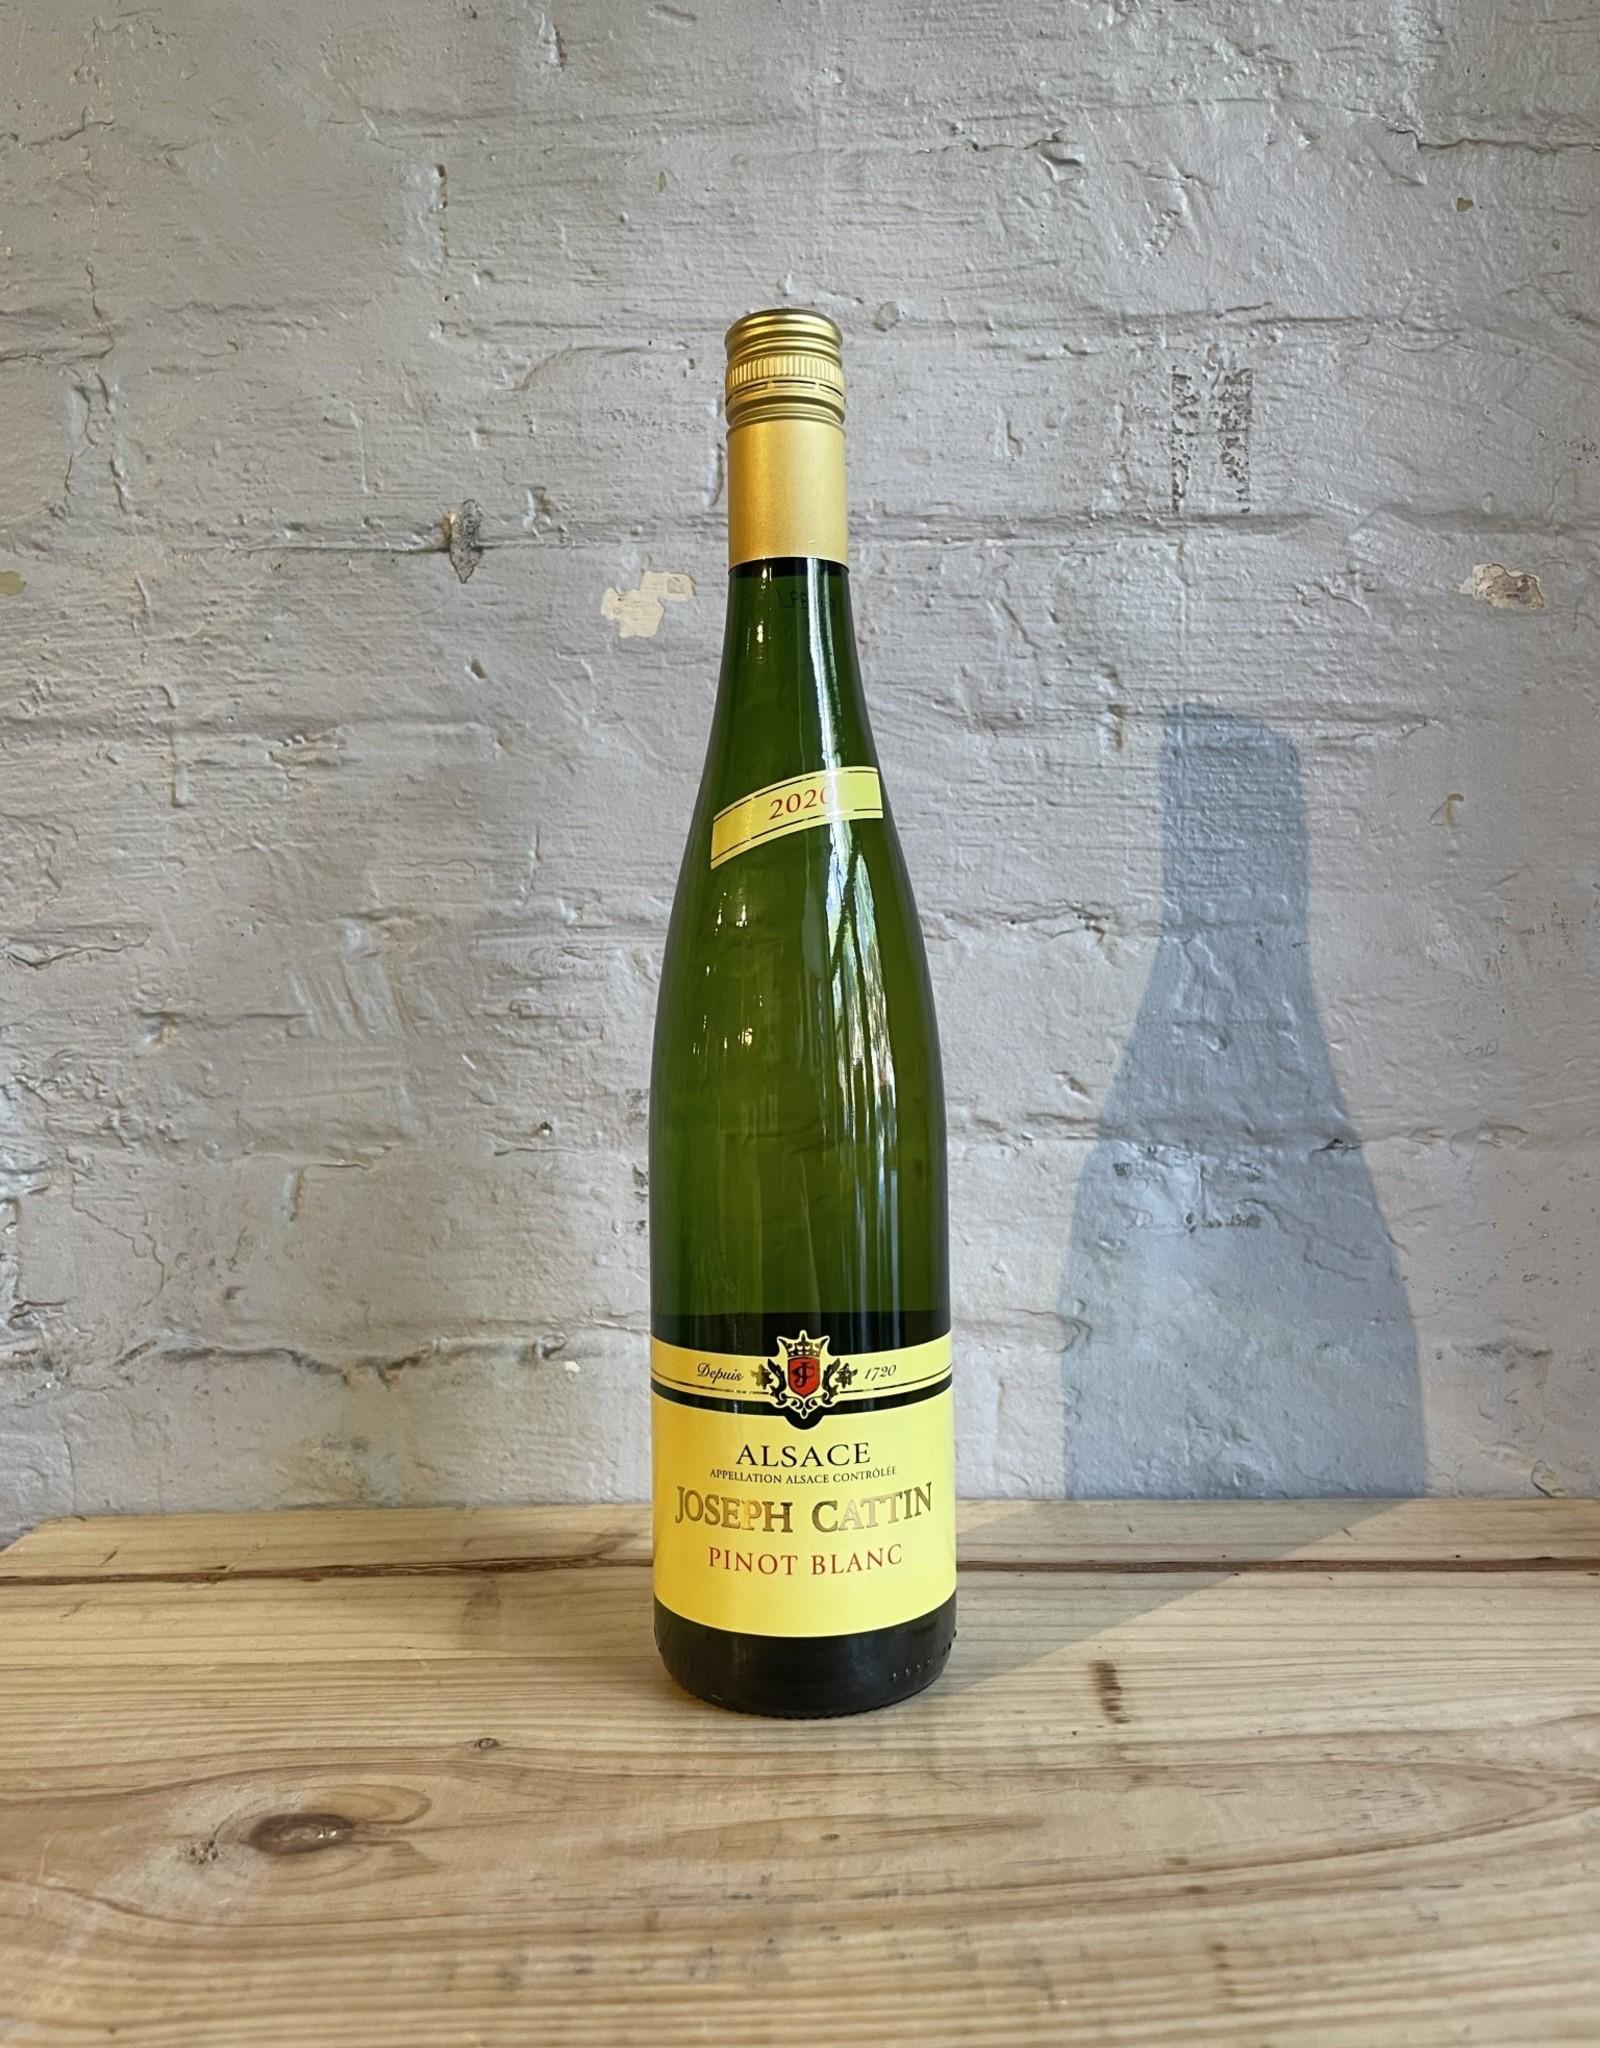 Wine 2020 Joseph Cattin Pinot Blanc - Alsace, France (750ml)